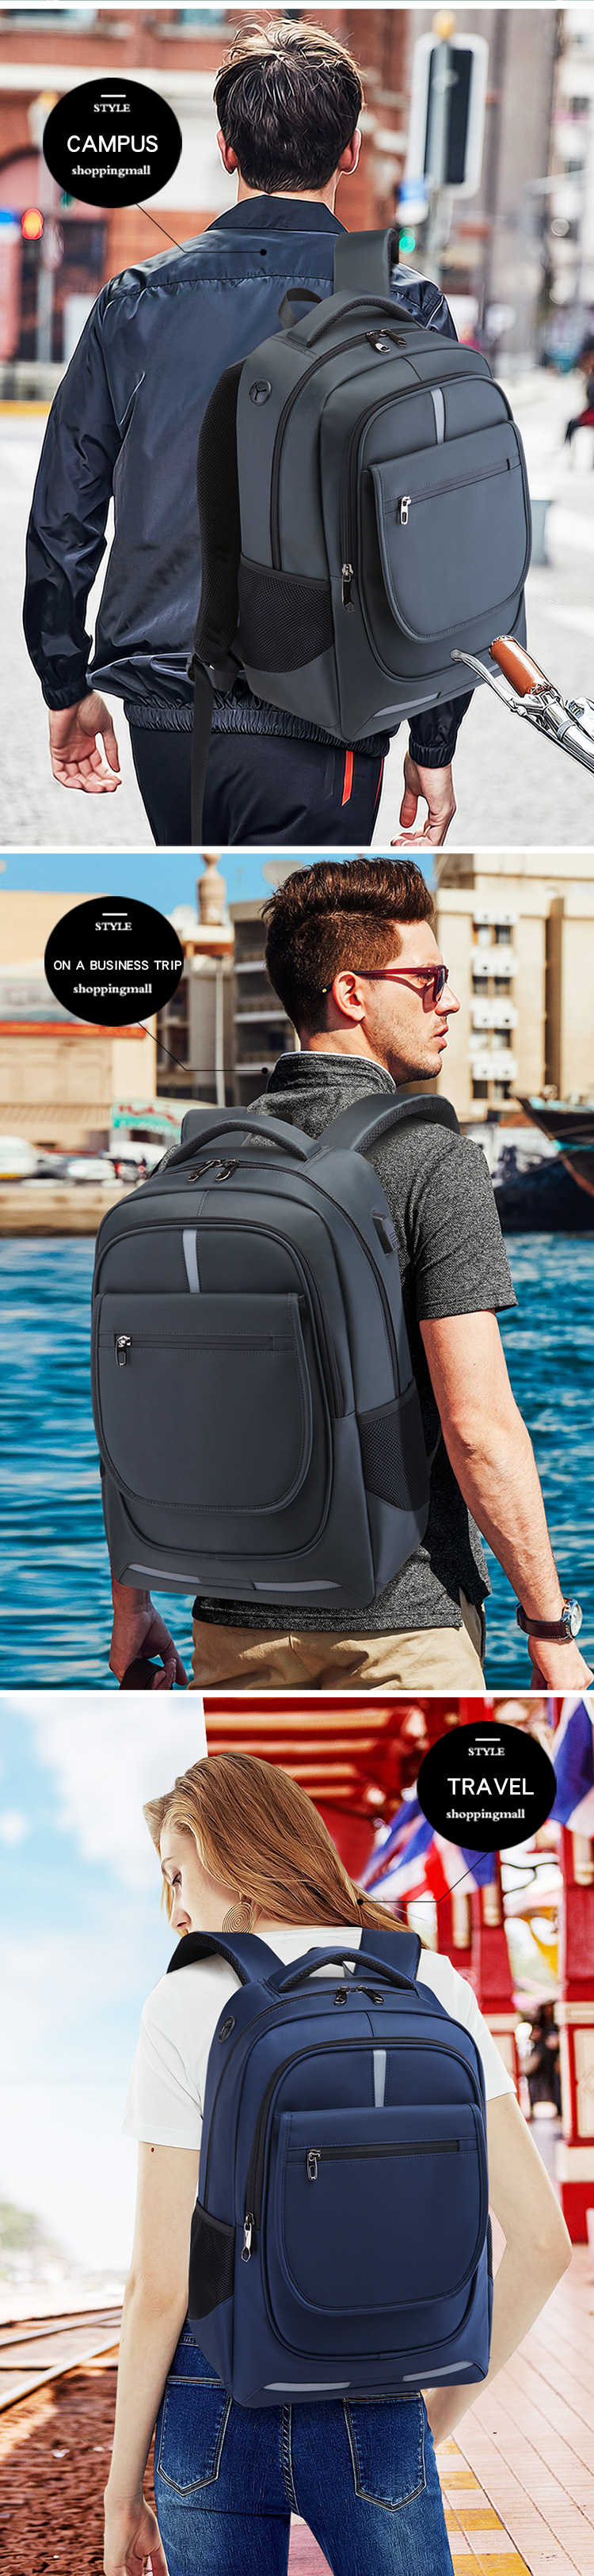 sacos de carregamento anti-roubo moda masculina mochila viagem bolsa hombre plecak